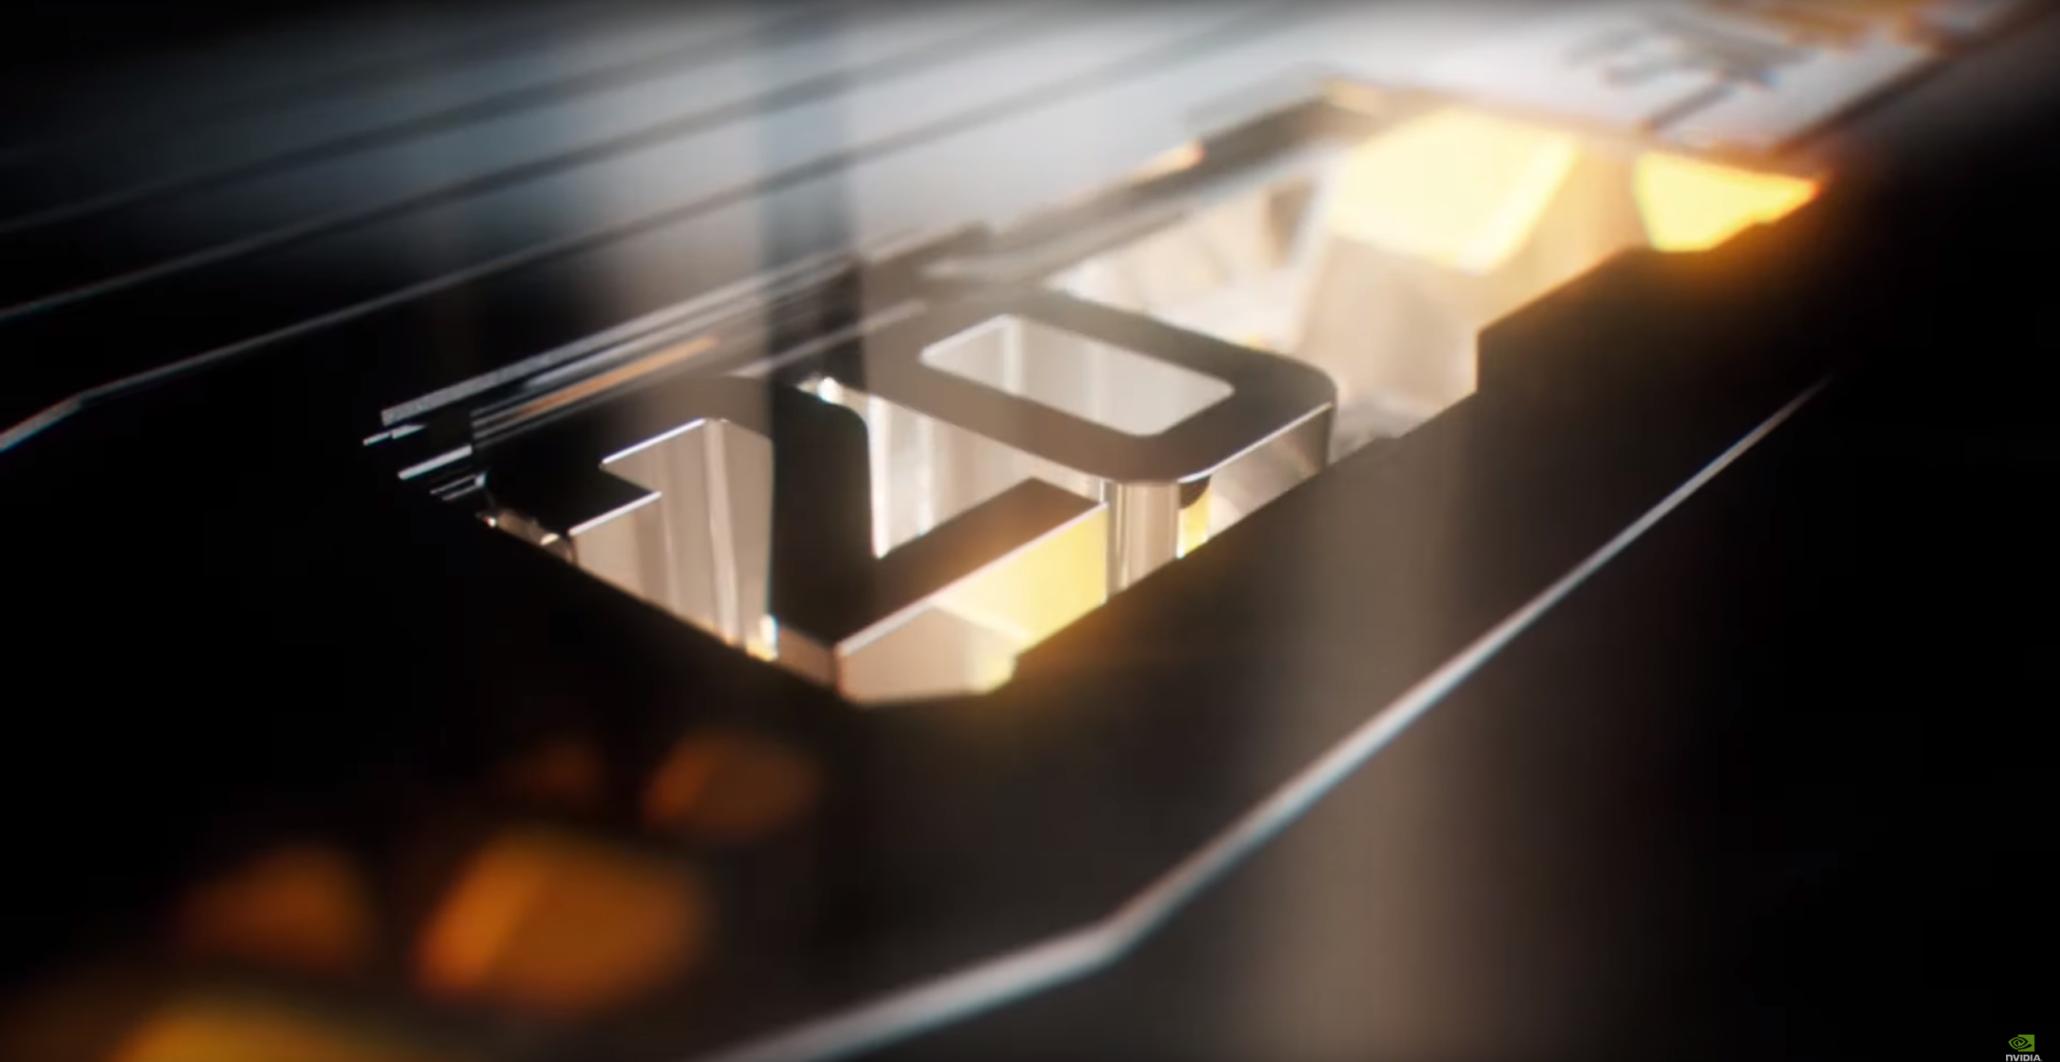 AMD Radeon RX 5700 & NVIDIA GeForce RTX 2070 SUPER GPU